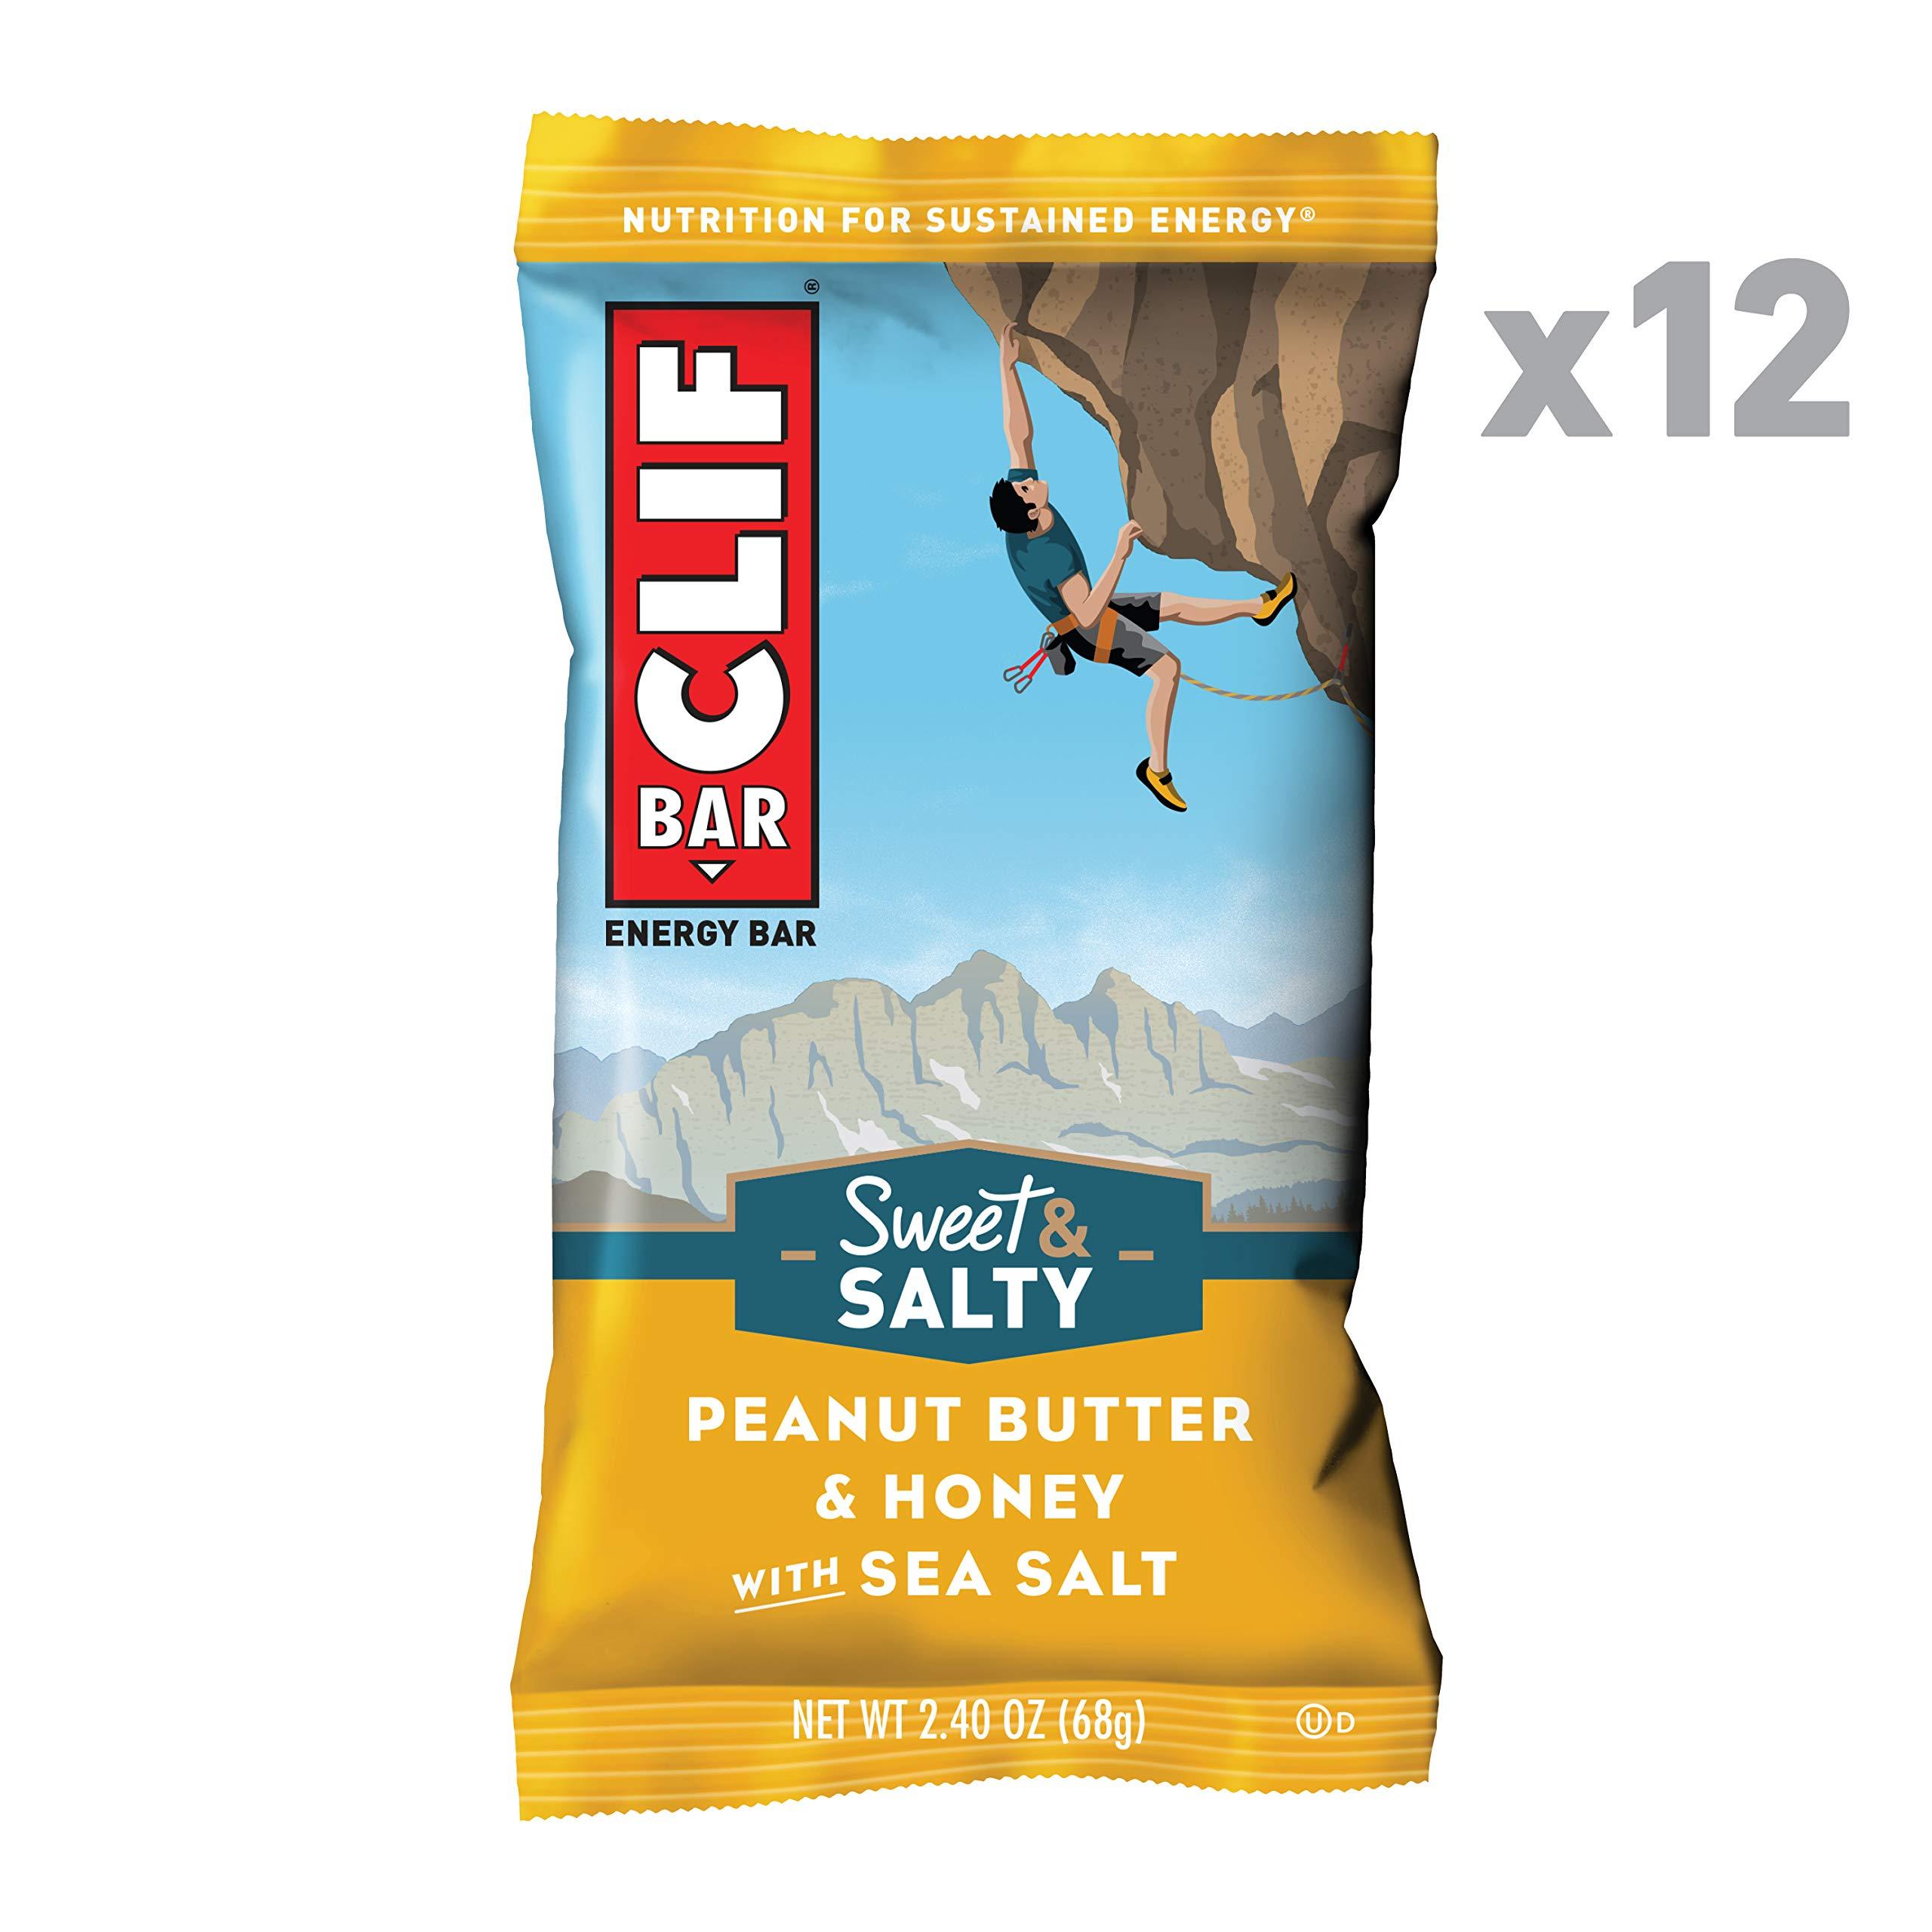 CLIF BAR - Sweet & Salty Energy Bars - Peanut Butter & Honey with Sea Salt - (2.4 Ounce Protein Bars, 12 Count) by Clif Bar